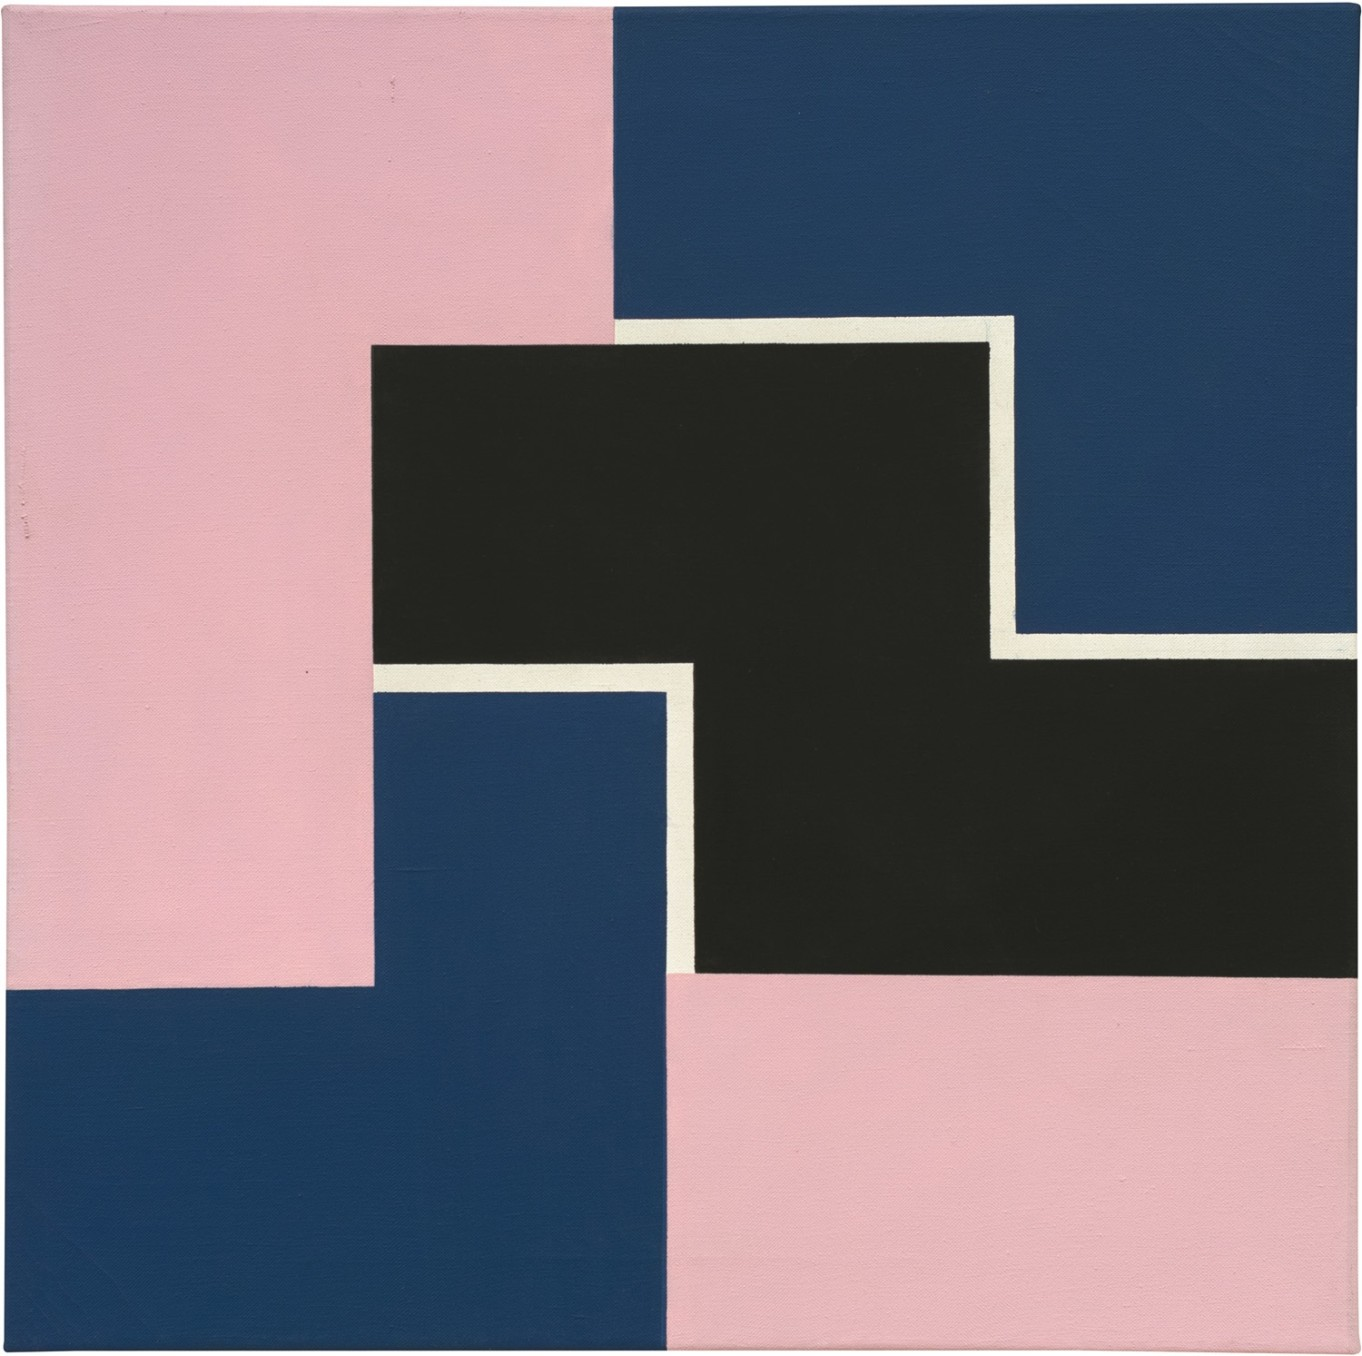 Mary Webb, PINK, BLUE & BLACK, 1969, Oil on canvas, 65 x 65 cm, 25 5/8 x 25 5/8 in, Framed: 70 x 70 x 4 cm, 27 1/2 x 27 1/2 x 1 5/8 in